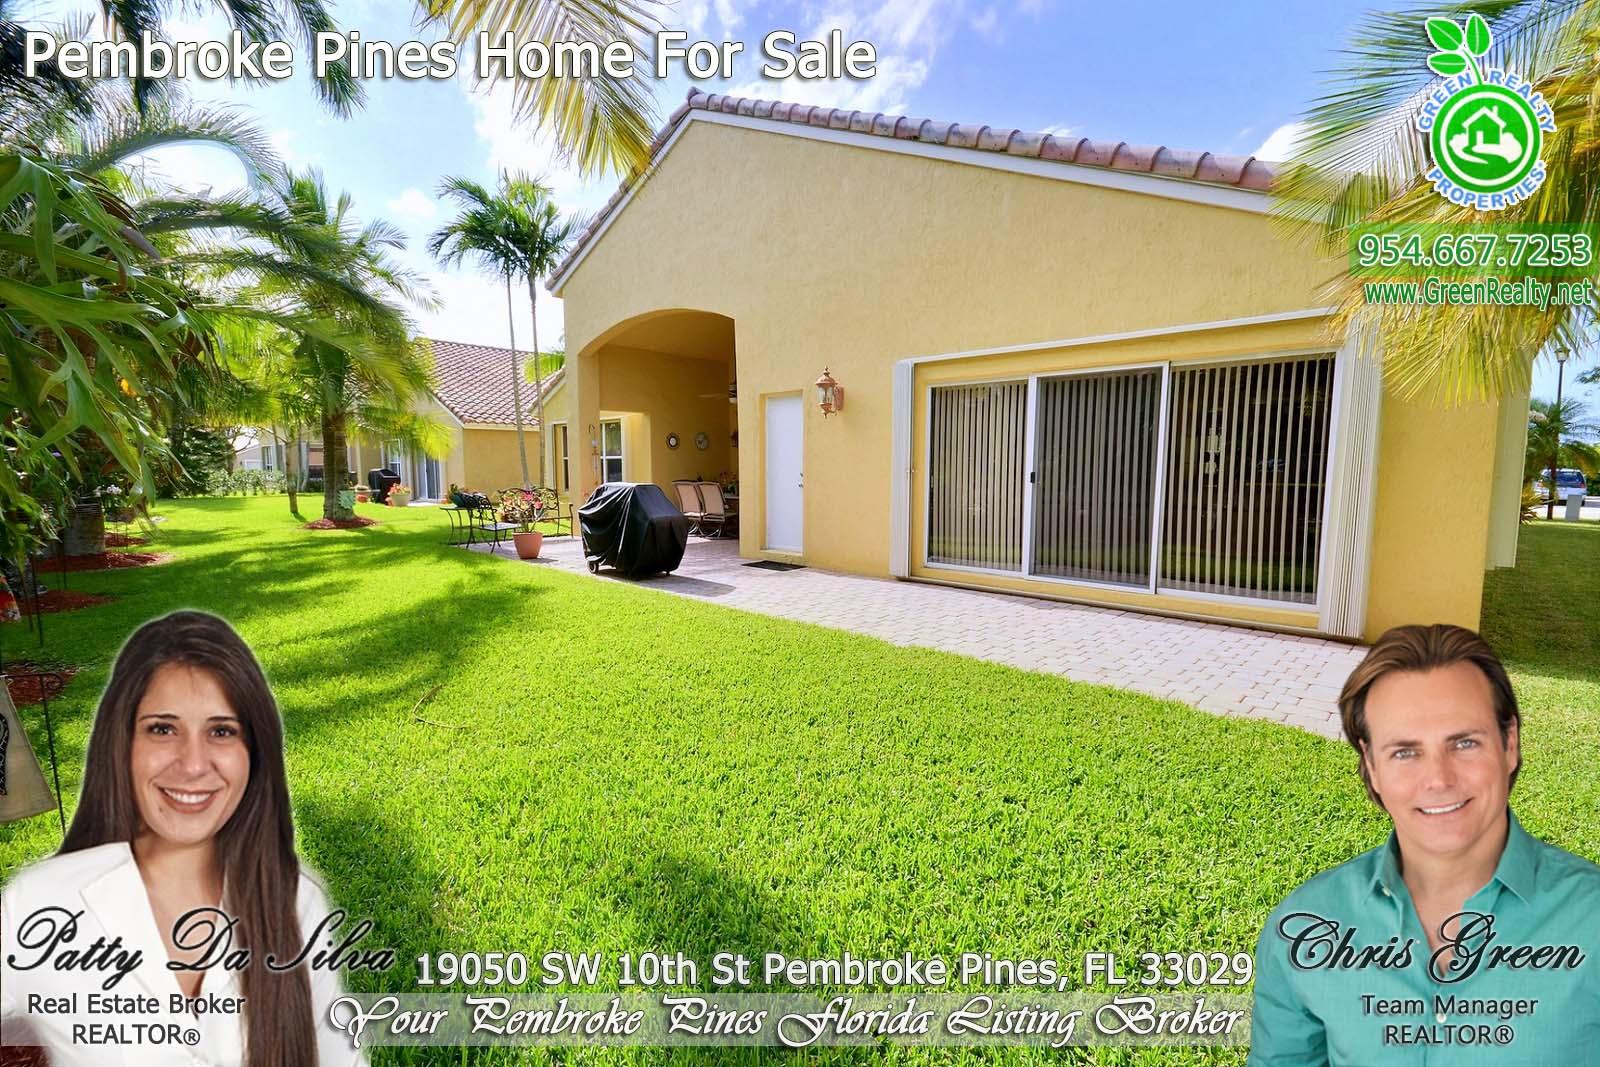 32 Homes For Sale in Encantada Pembroke Pines (4)